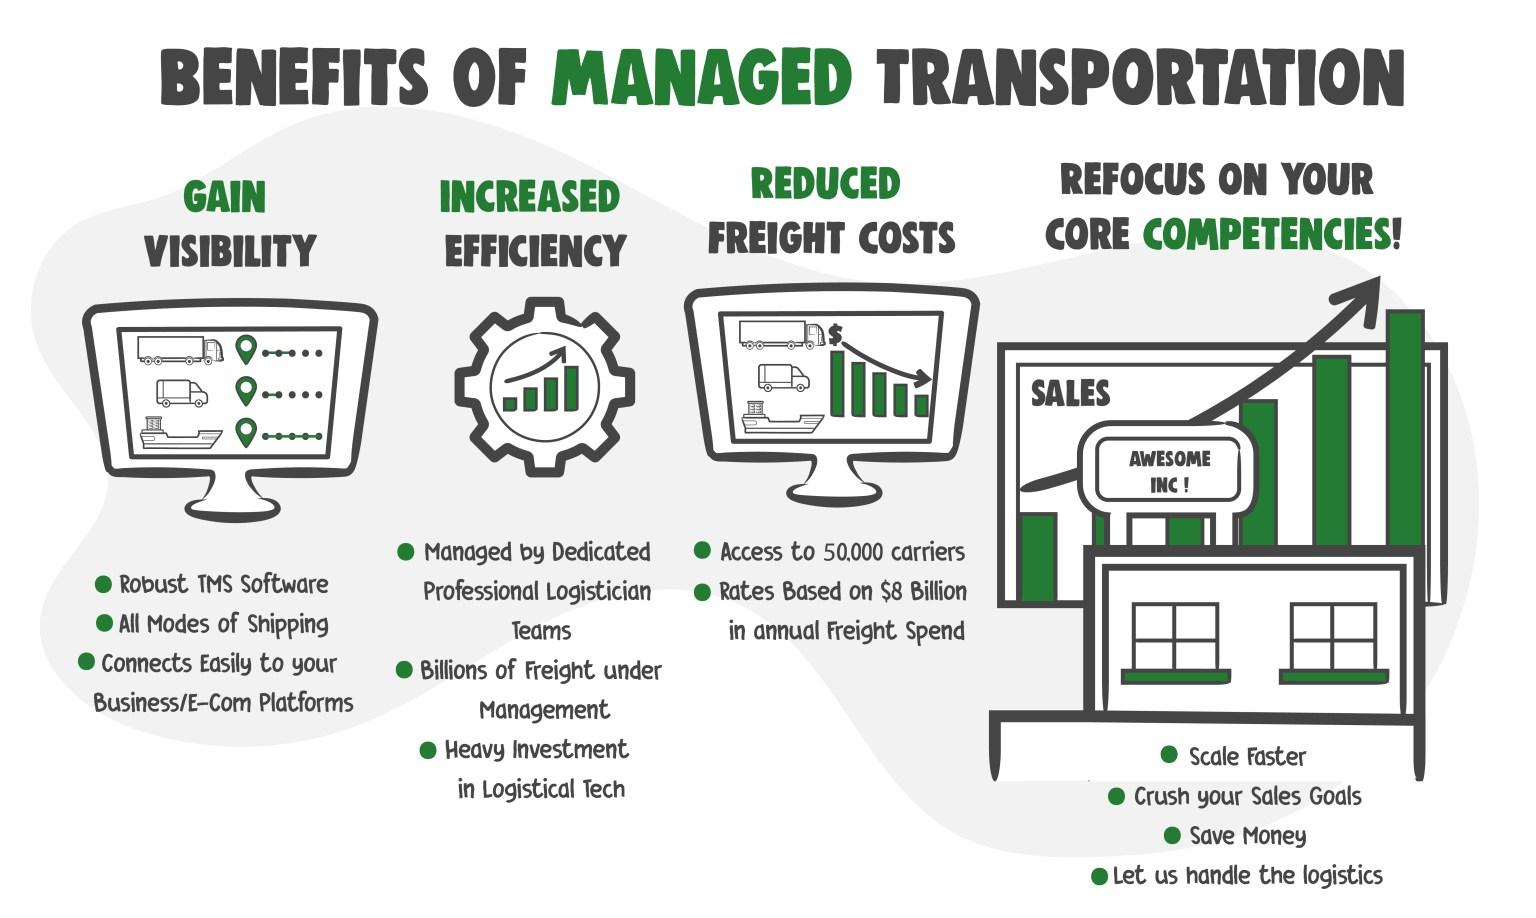 Managed Transportation Services Benefits